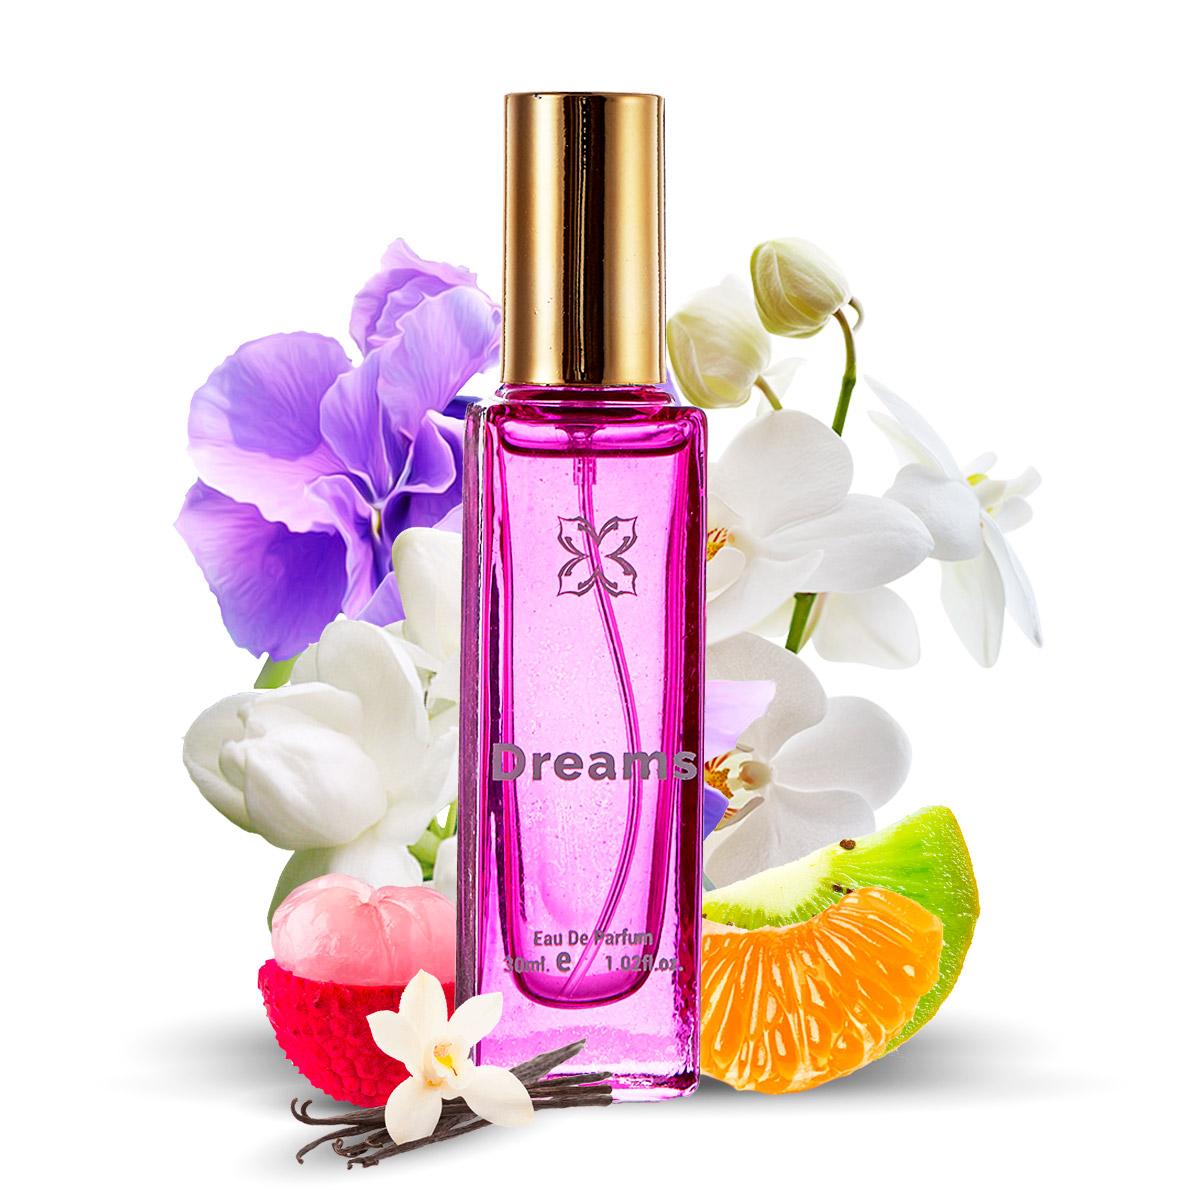 Essenciart Dreams Perfume Feminino Importado Edt 30ml